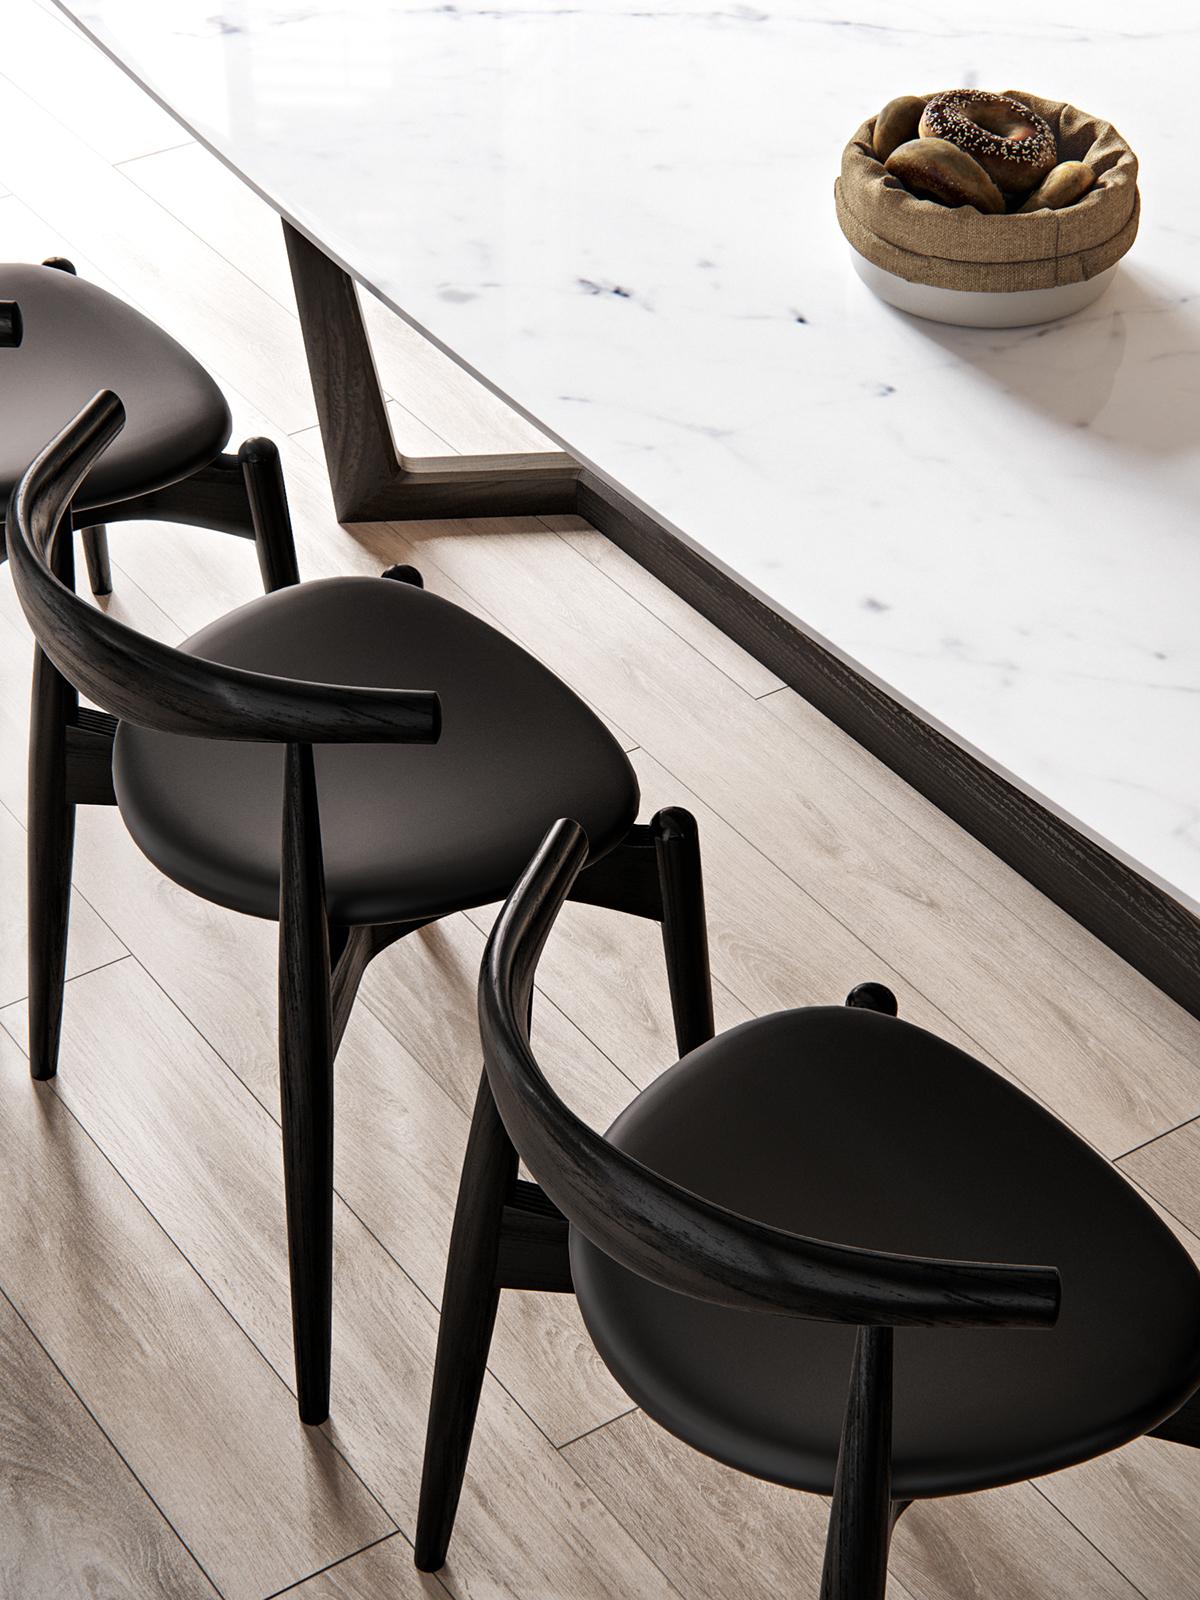 White, Gold & Classic Interior Design Project You'll Love